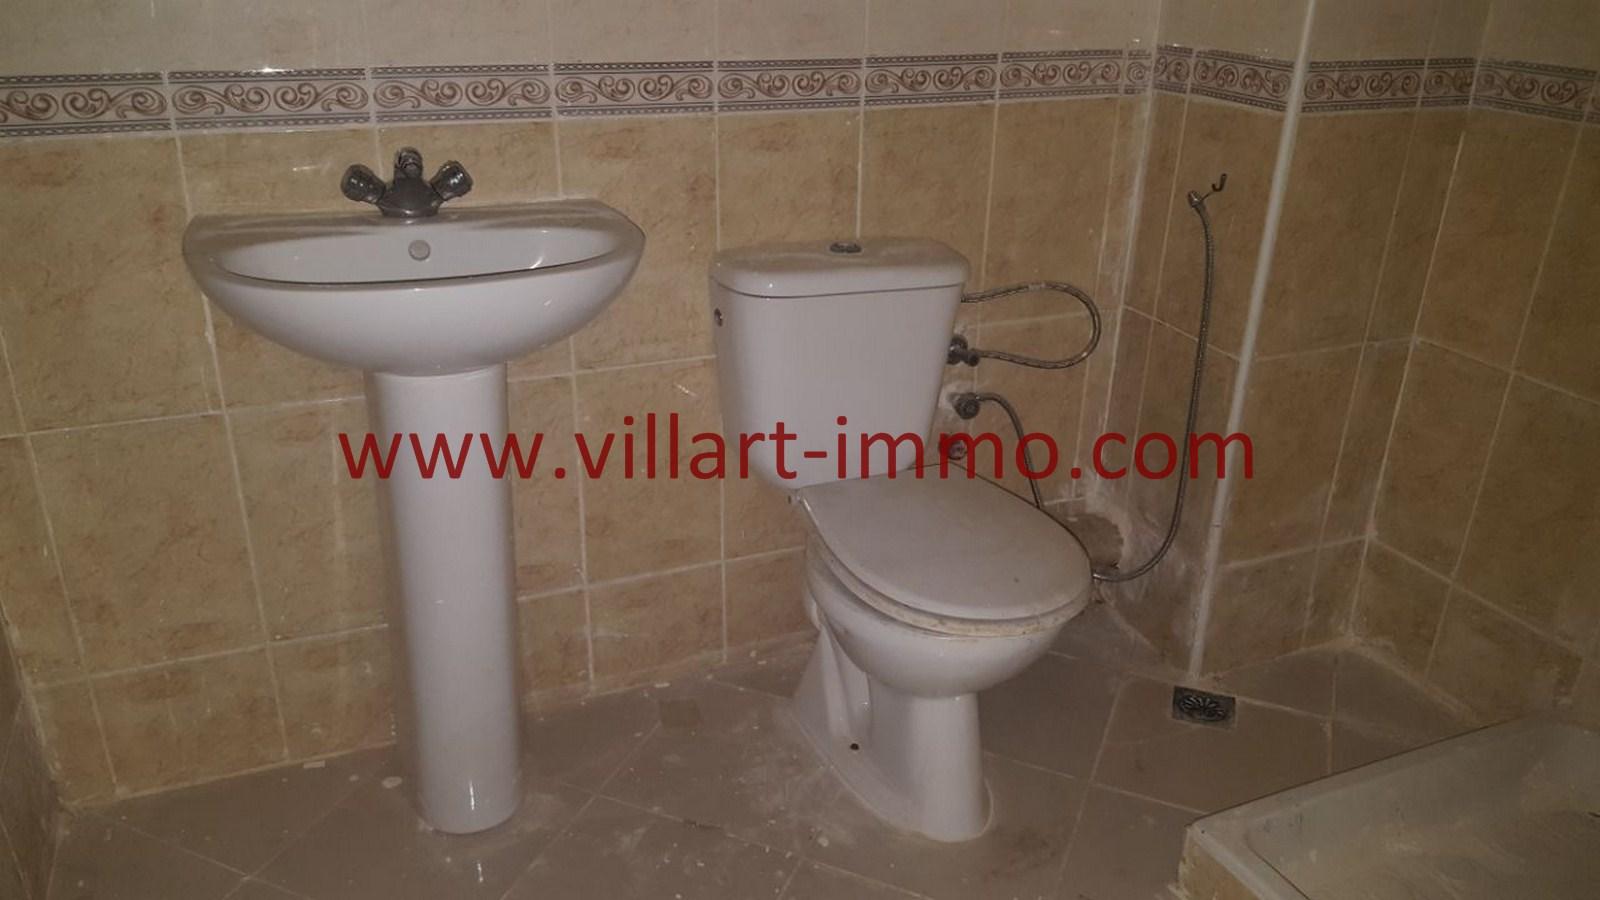 4-Vente-Appartement-Tanger-Mojahidine -Salle-De-Bain-VA485-Villart Immo